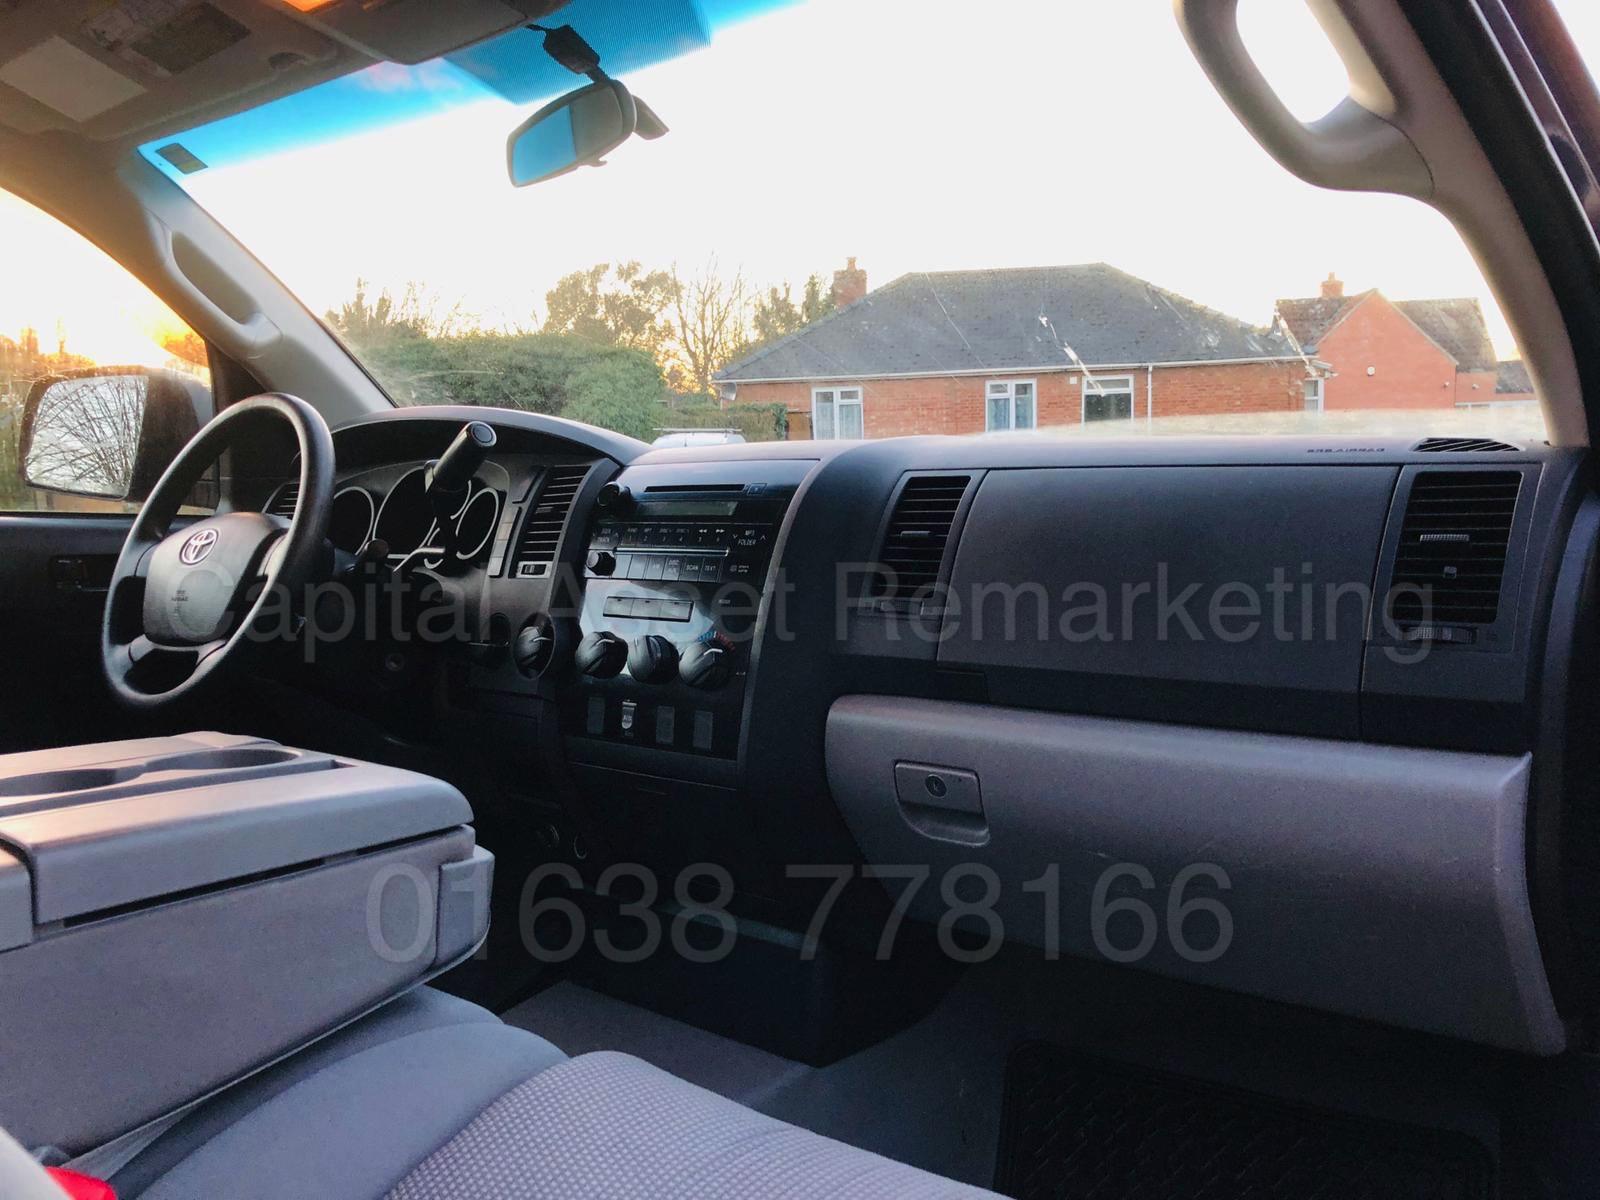 Lot 21 - TOYOTA TUNDRA *I-FORCE EDITION* SINGLE CAB PICK-UP (2008) 'V8 ENGINE - AUTOMATIC' **UK REGISTERED**